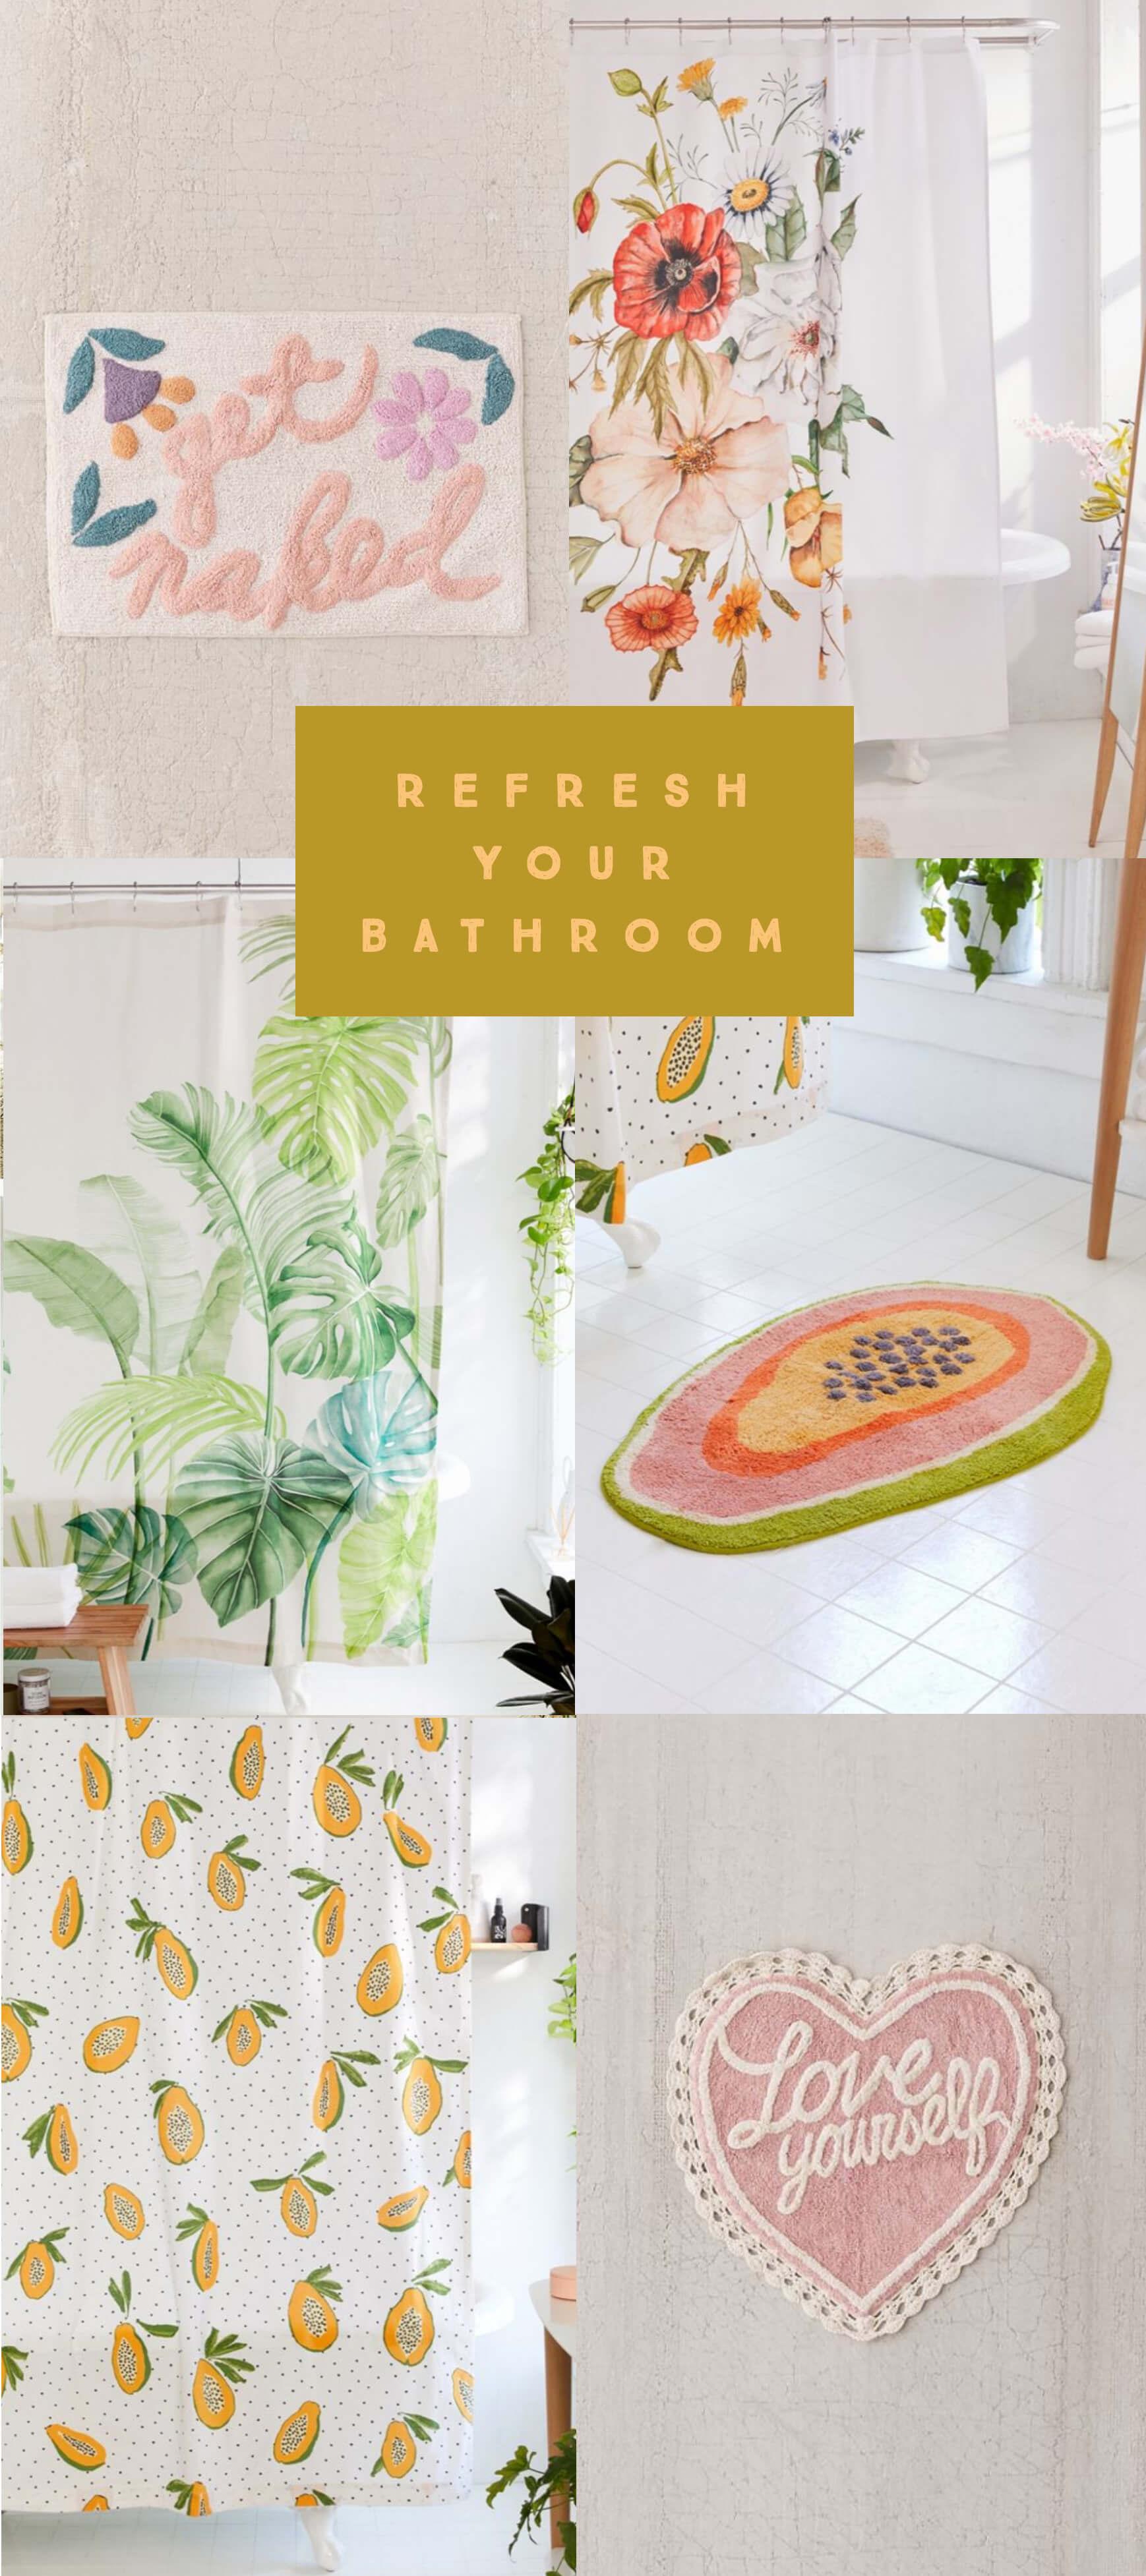 RefreshYourBathroom-SpringHomeUpgrade.jpg